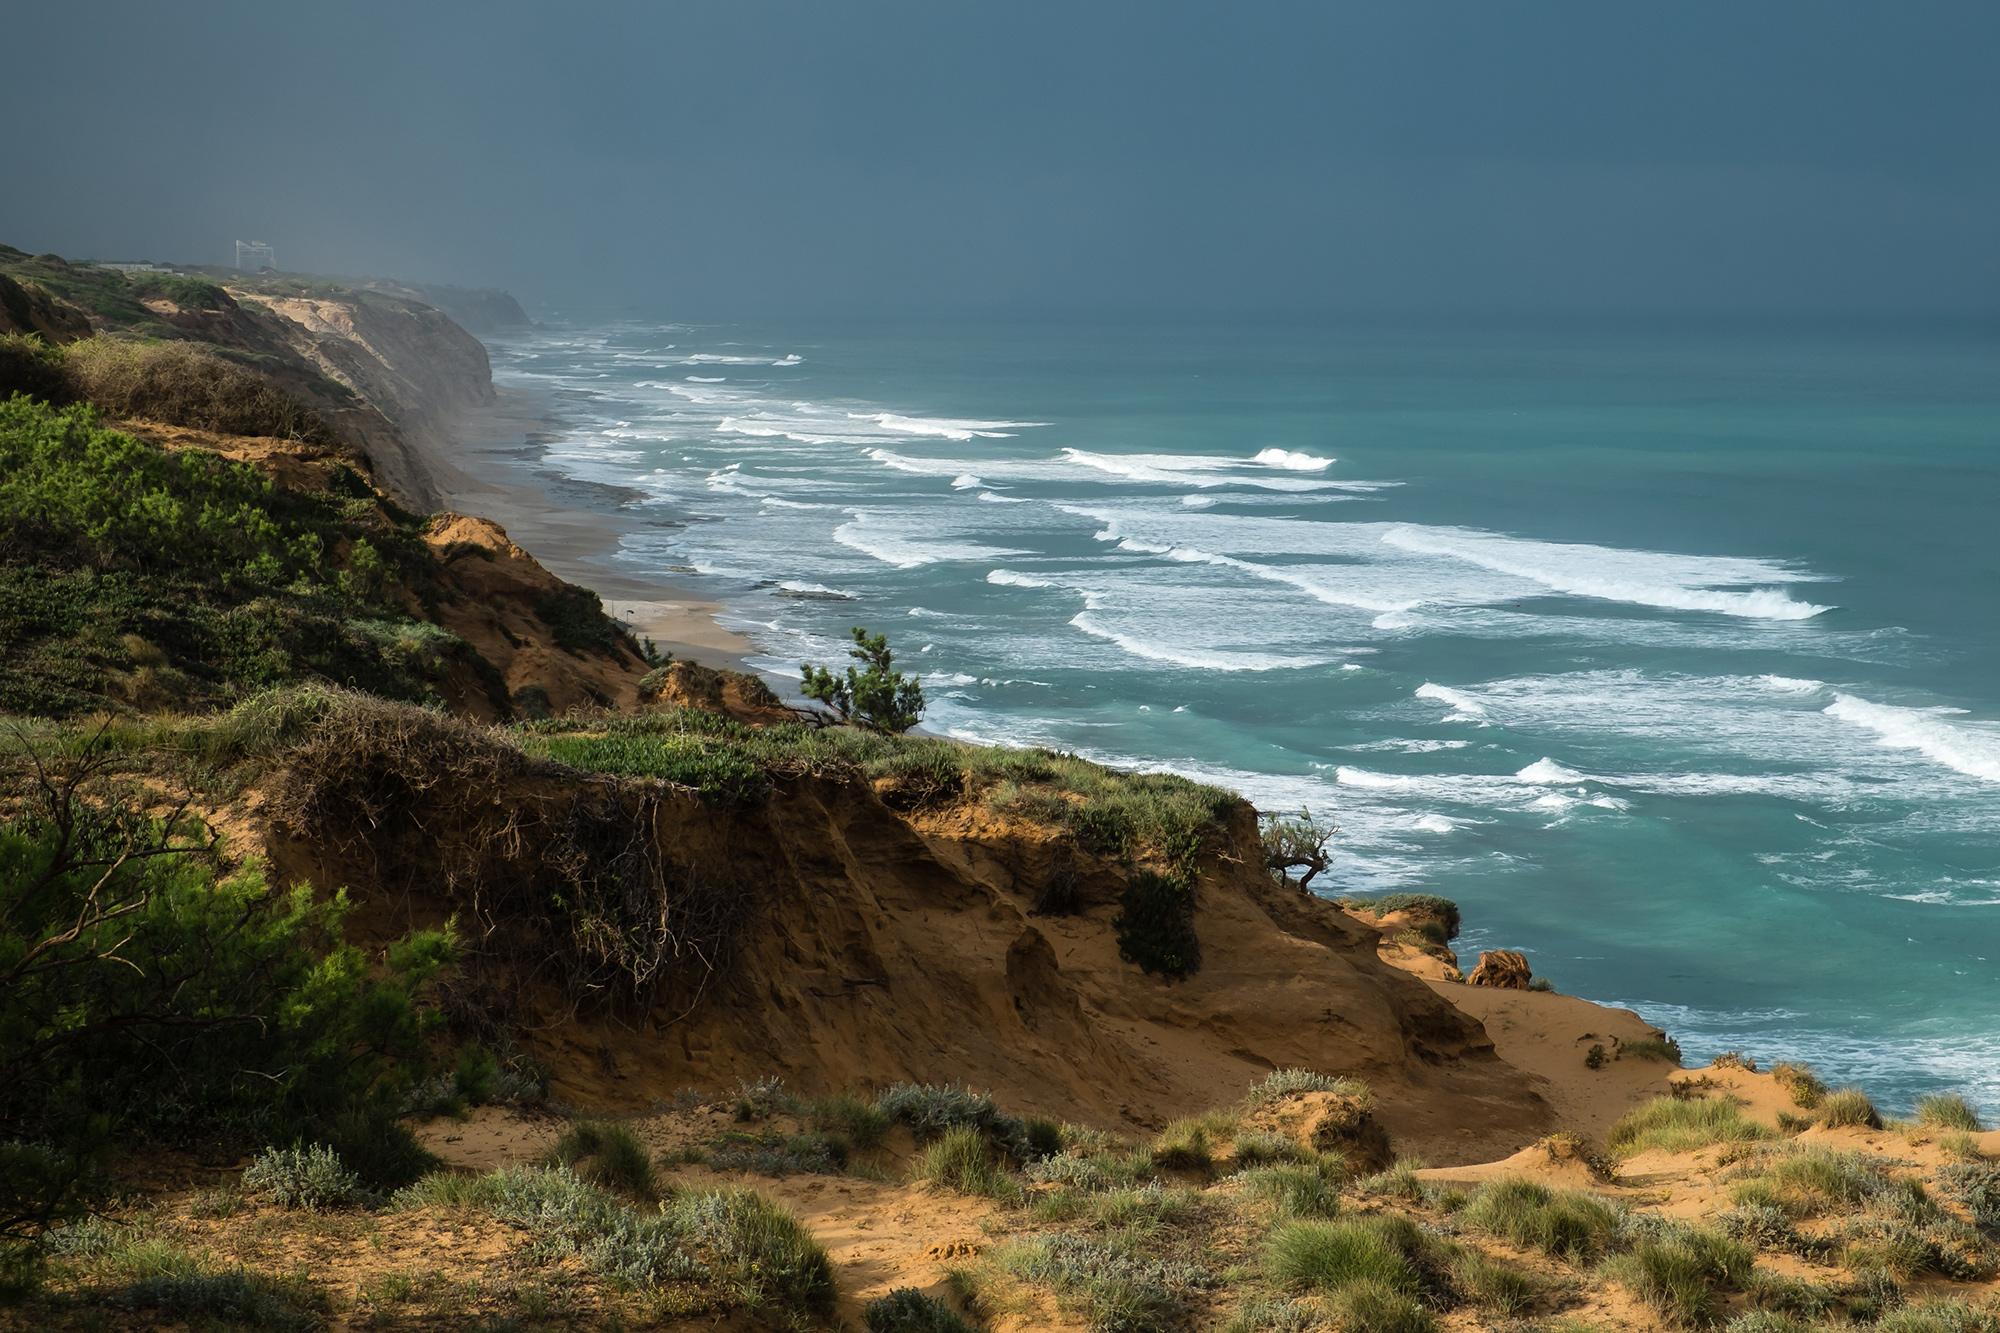 Israel National Trail Dünen